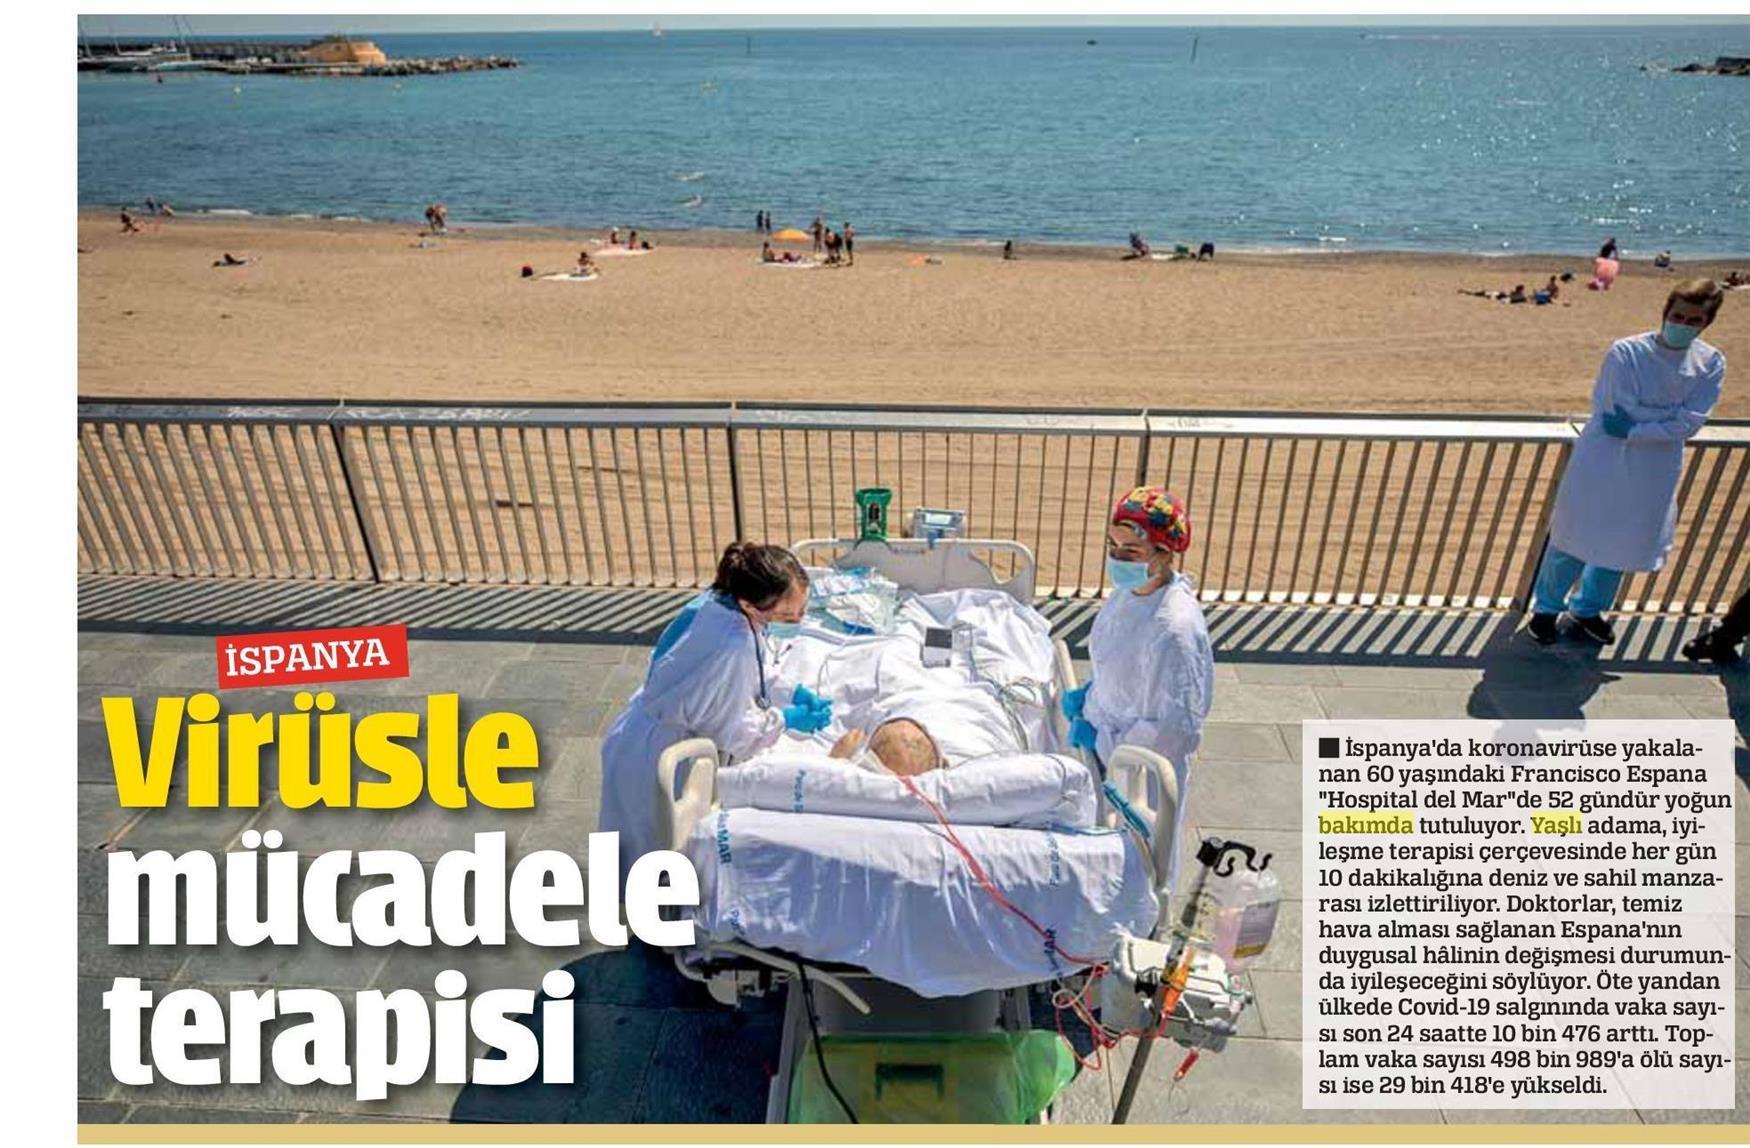 İspanya'da Virüsle Mücadele Terapisi